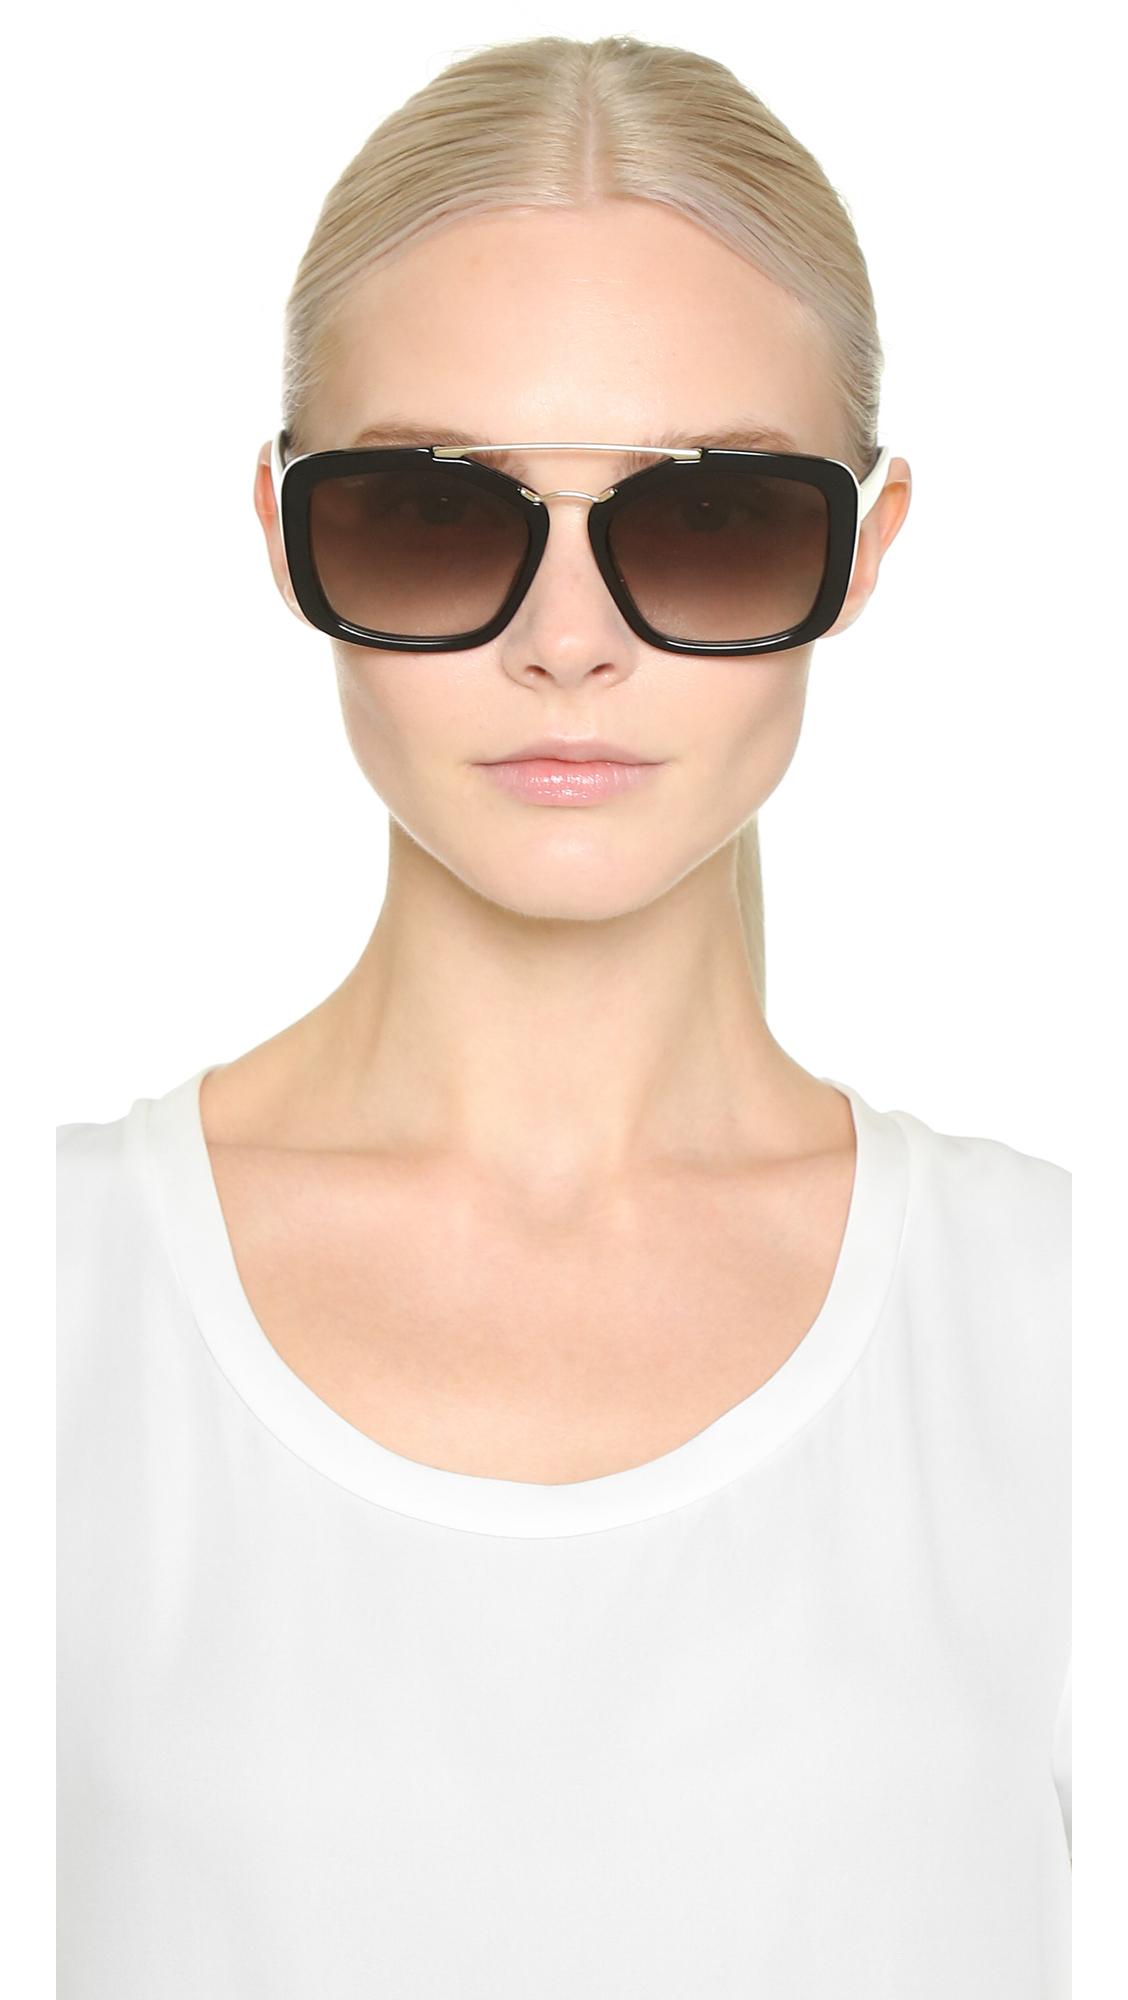 e6bbbbbe062 ... where can i buy norway lyst prada catwalk aviator sunglasses black grey  gradient in black 2523e